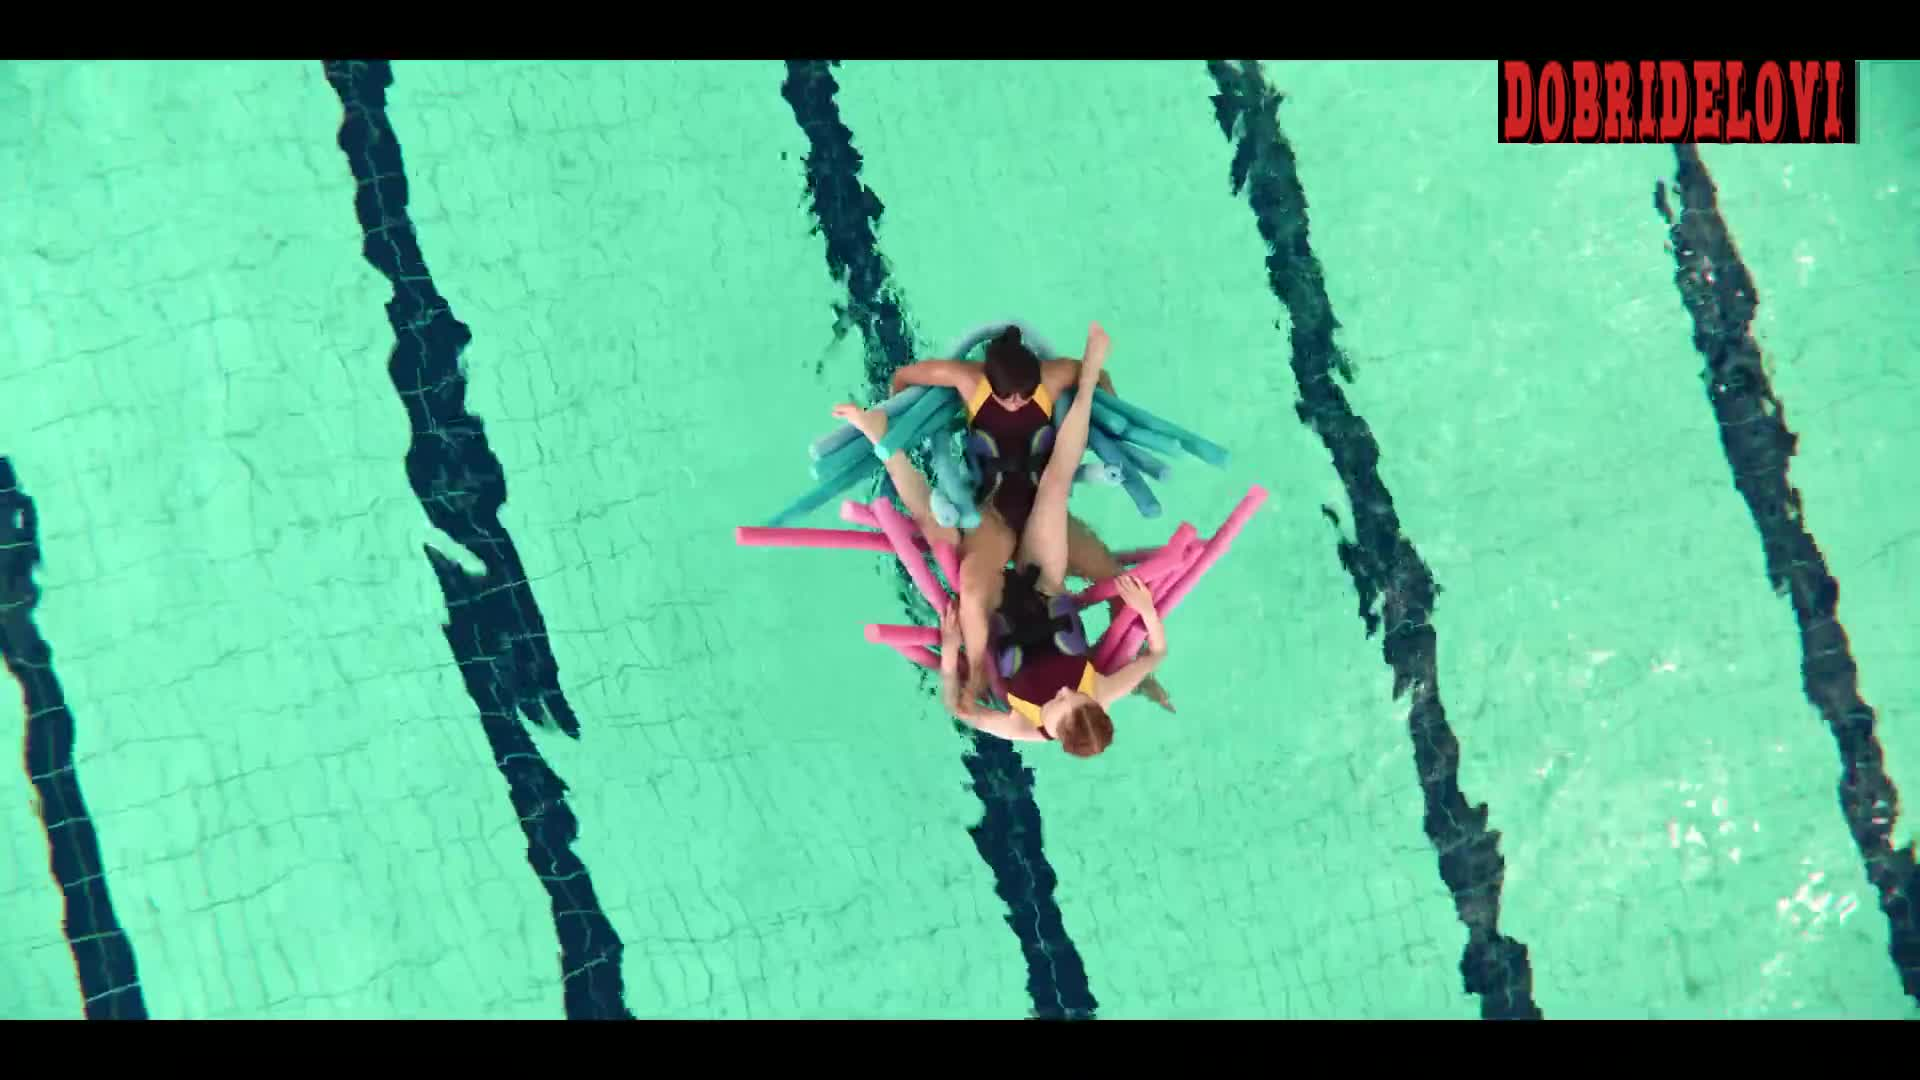 Lily Newmark lesbian scissoring scene in the pool